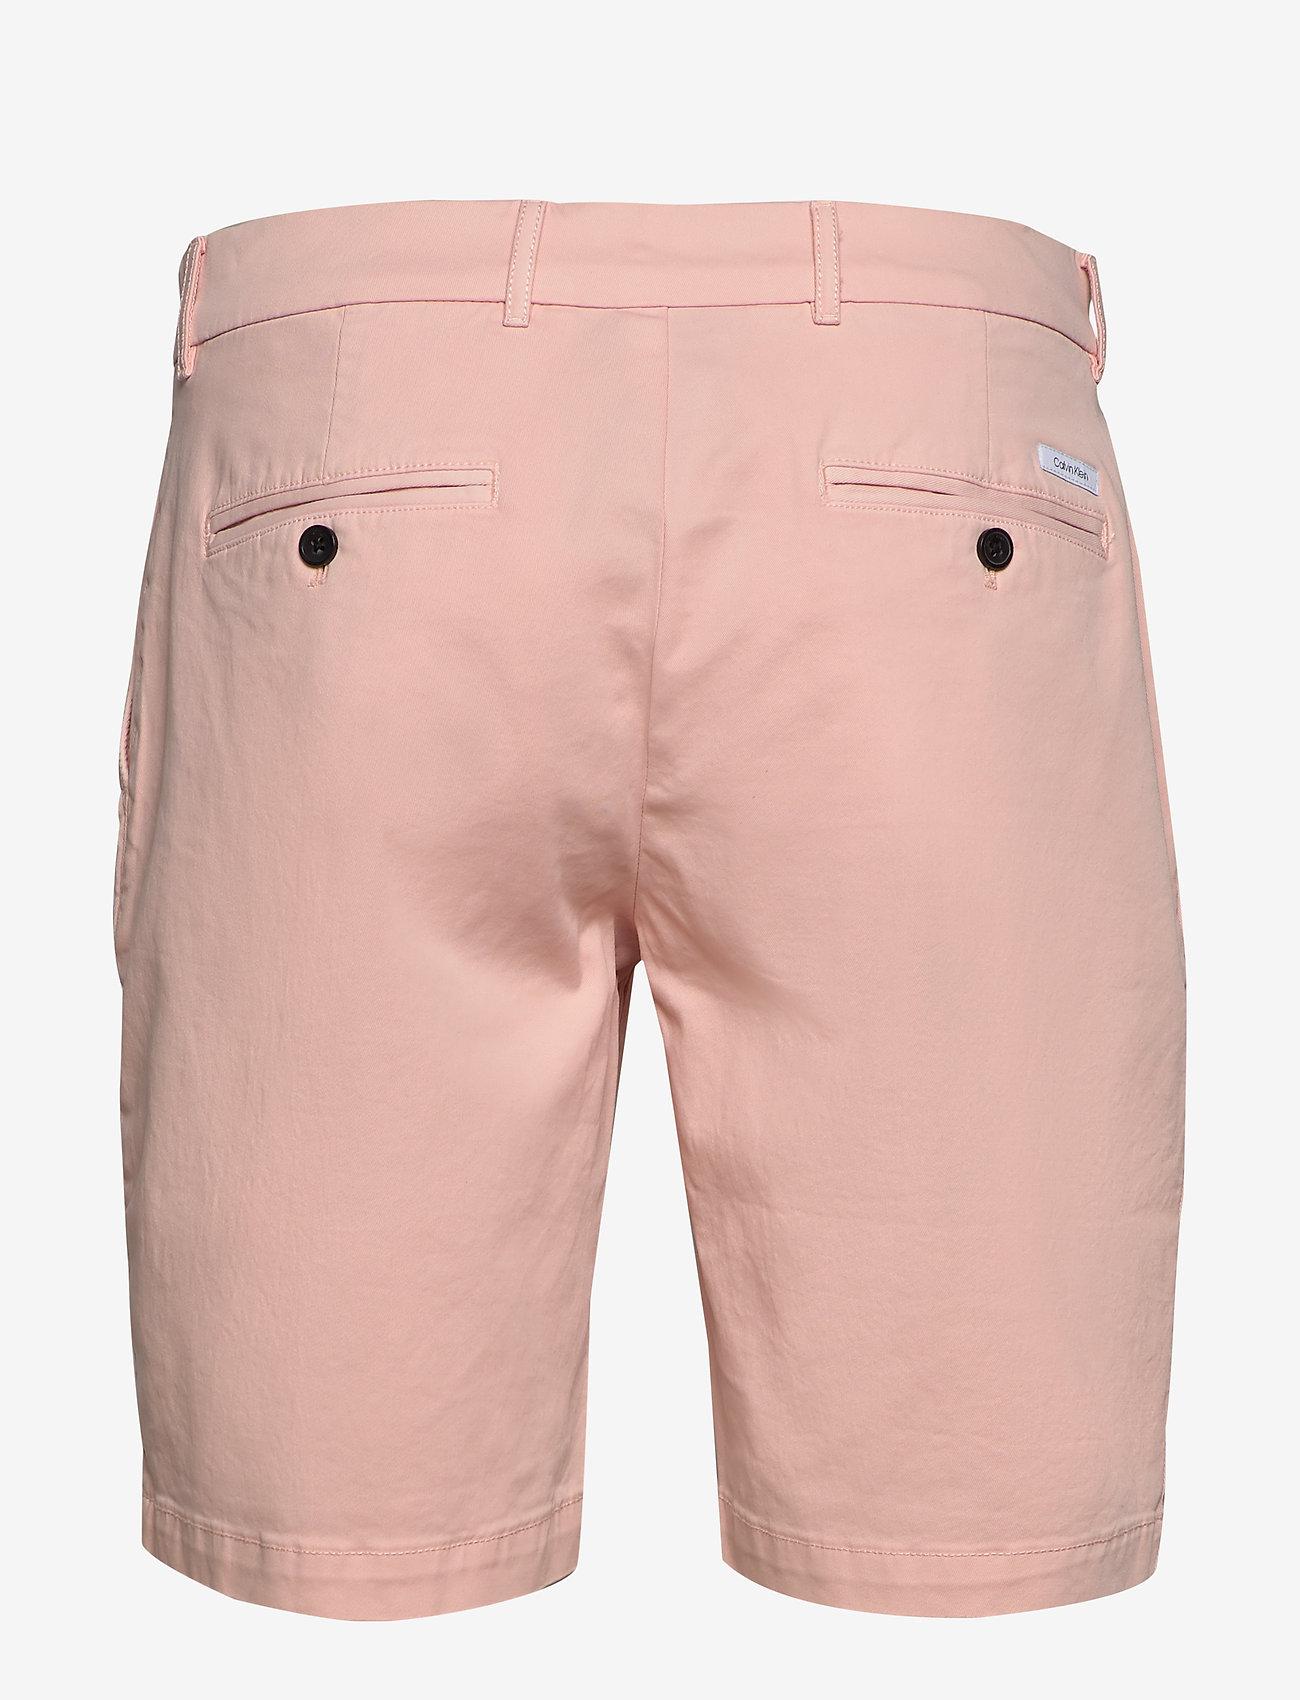 Calvin Klein - SLIM FIT GARMENT DYE - tailored shorts - nude lustre - 1